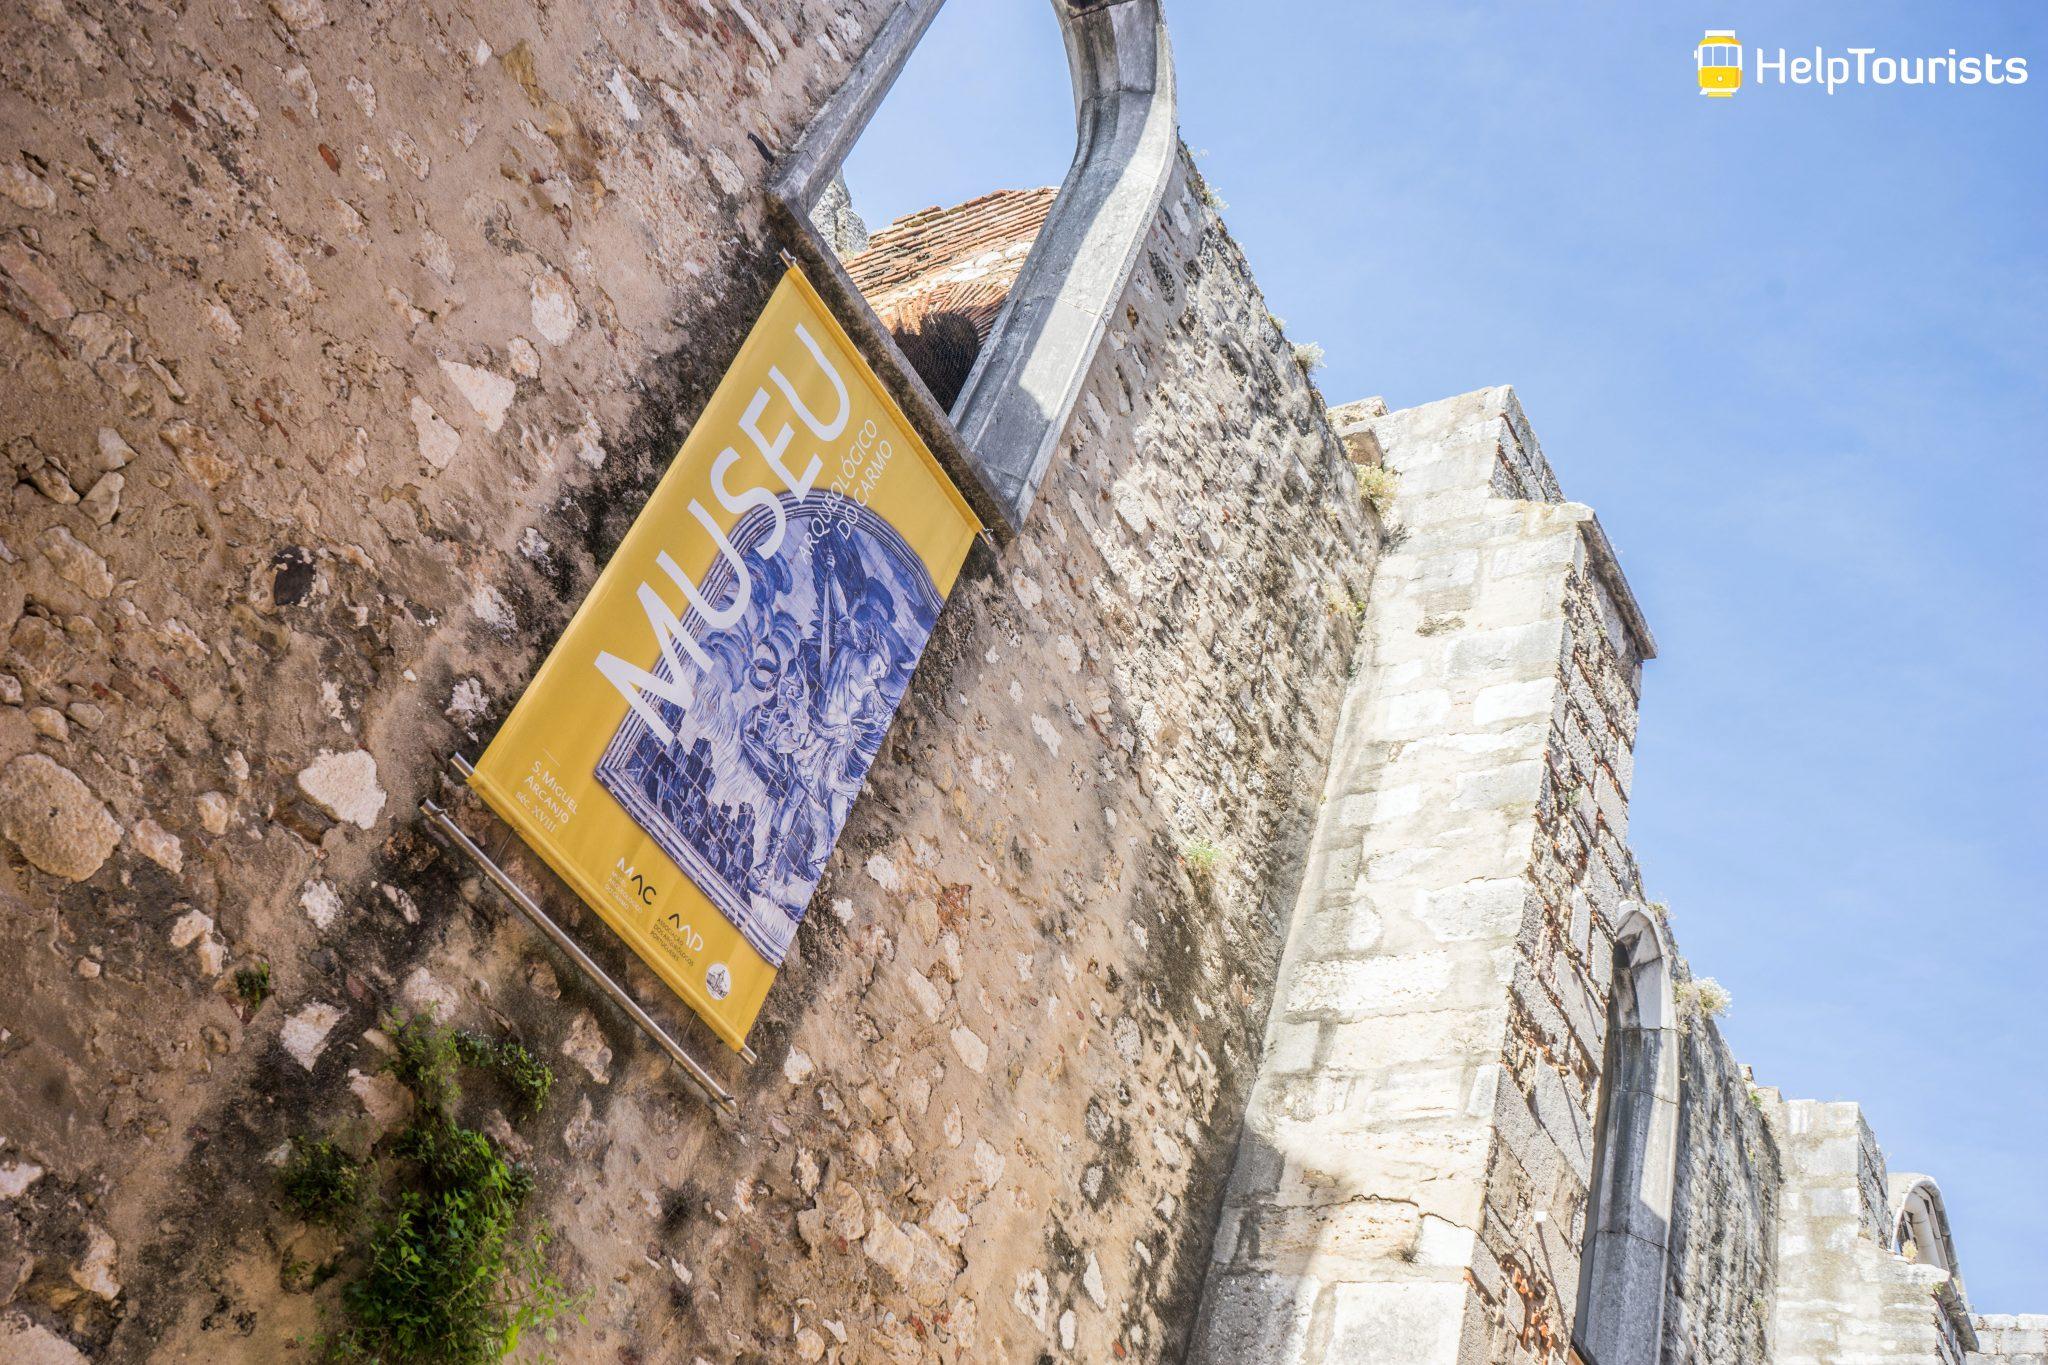 Lissabon_Museo-Arquelogico-do-Carmo_Schild